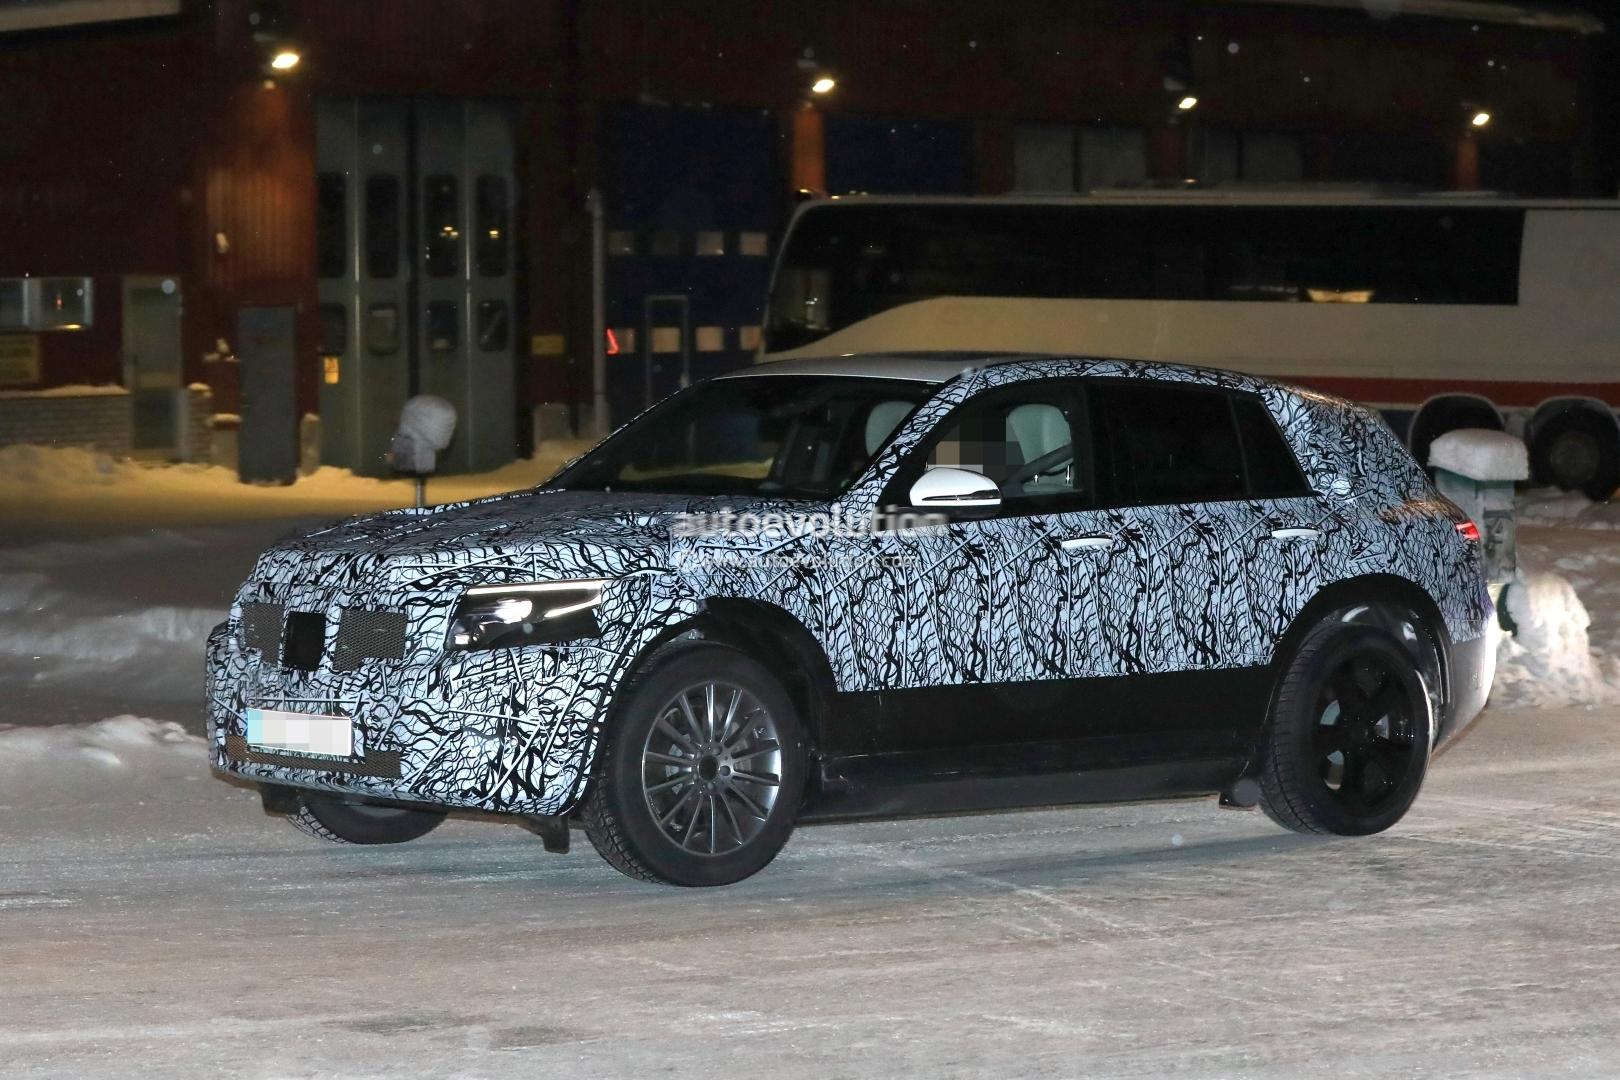 2020 Mercedes Benz Eqc Electric Suv Makes Spyshot Debut Prototype Looks Sleek Autoevolution